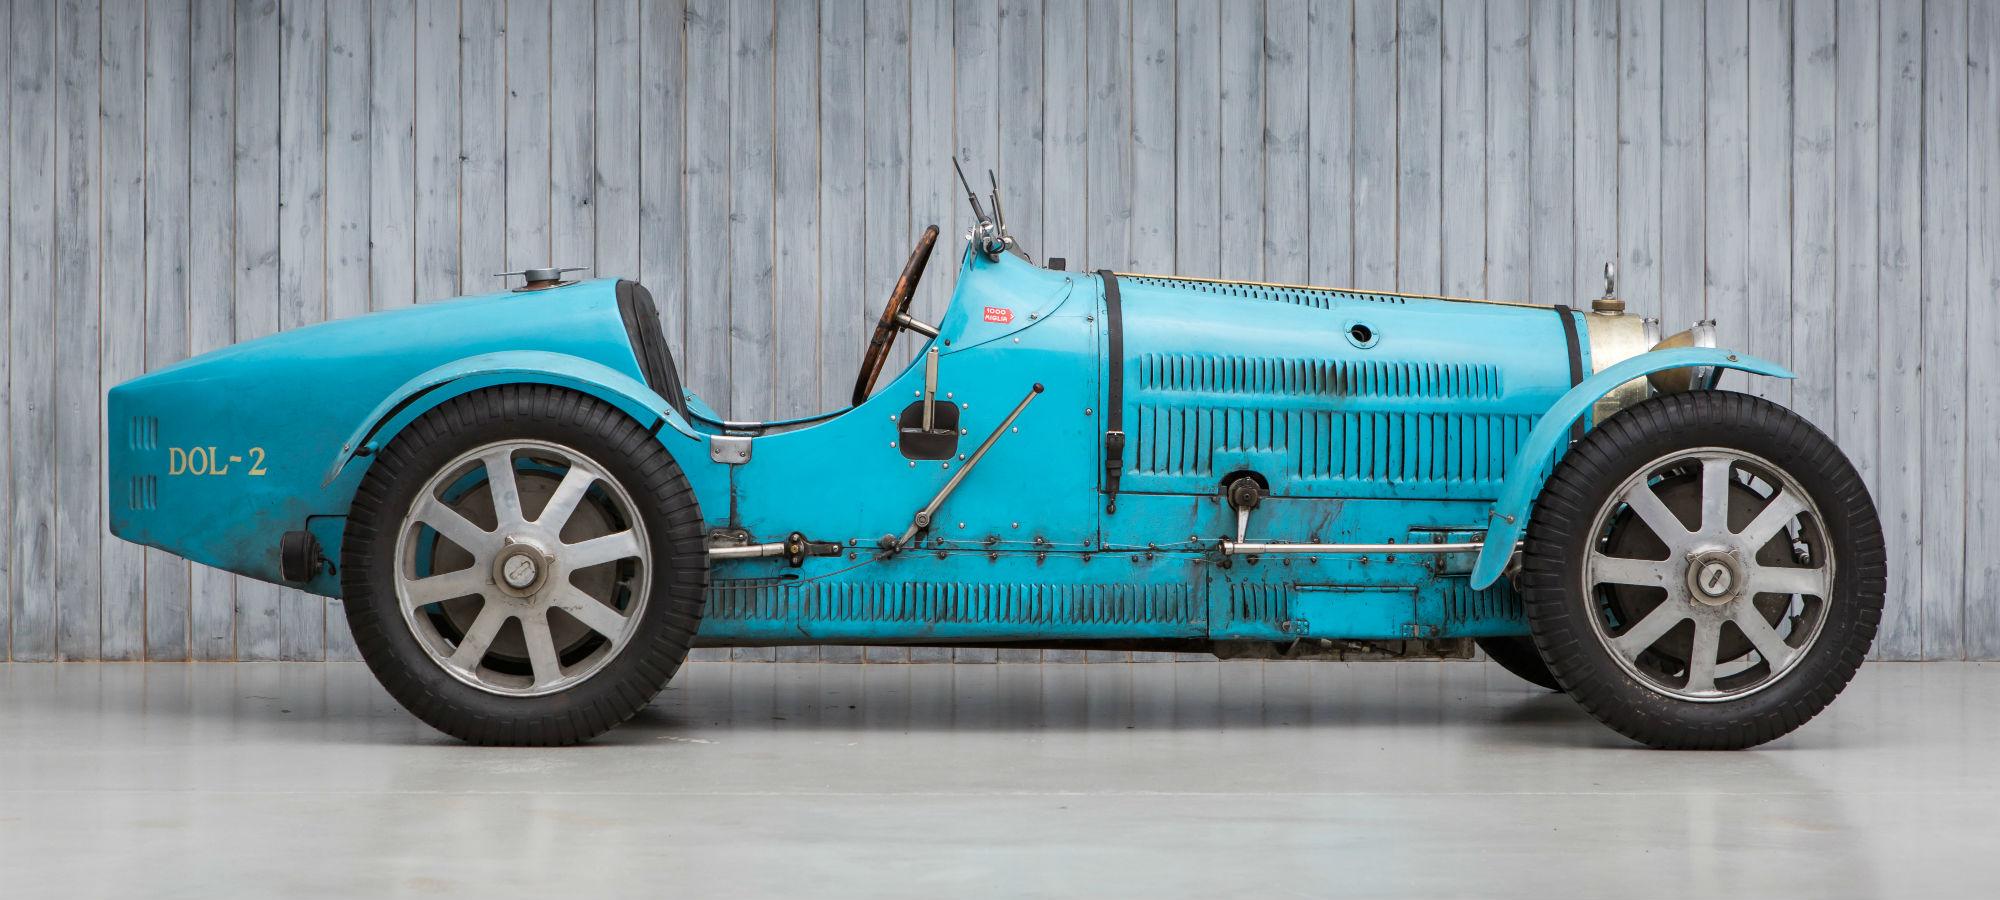 The Ex - Sir Malcolm Campbell, Bernard Kain 1926 Bugatti Type 35 to 35B